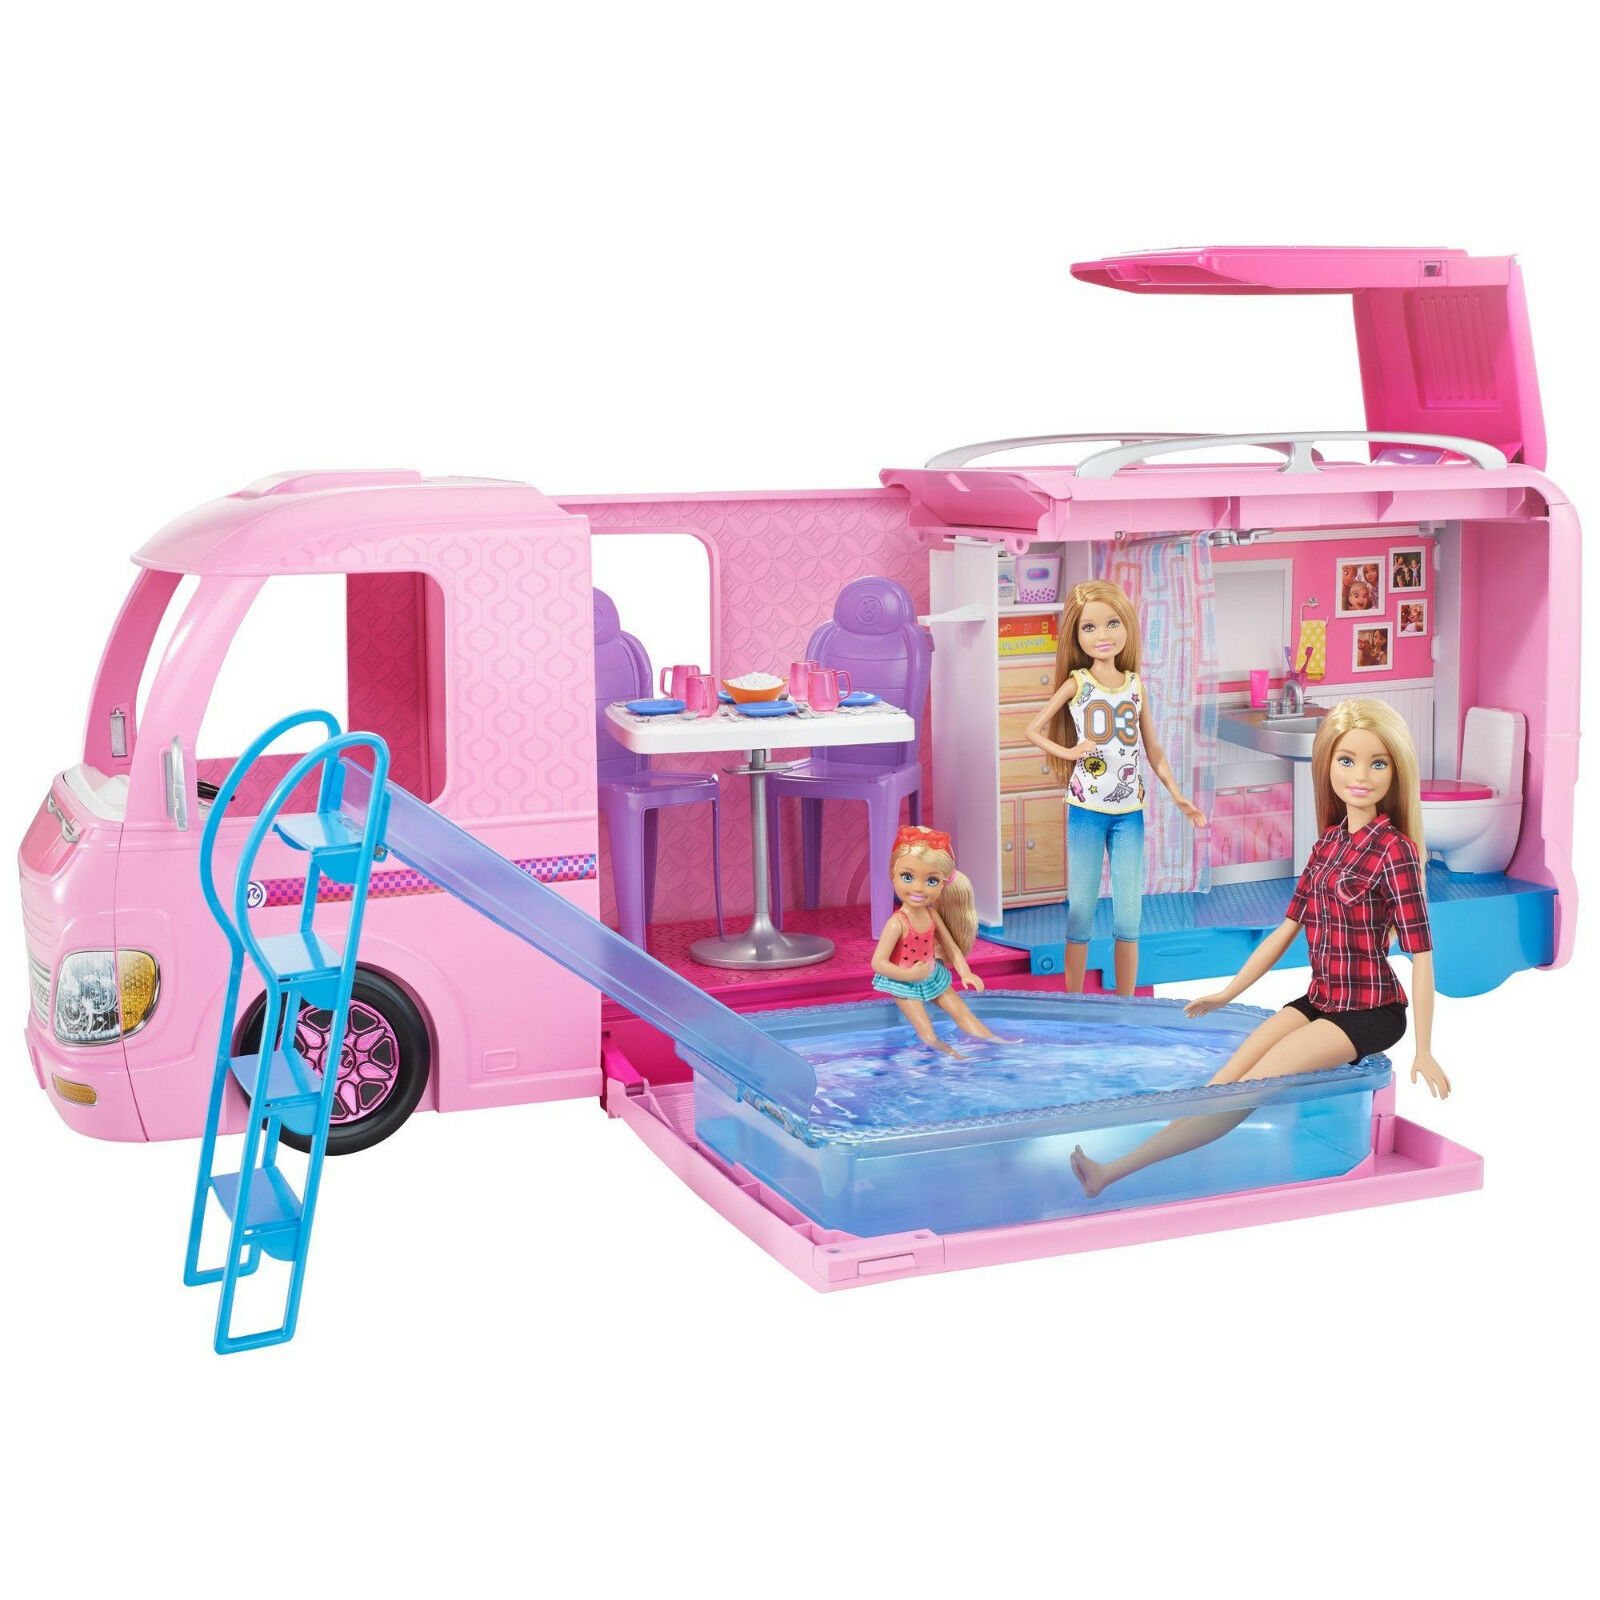 Barbie Dream Camper spelagset (Glamping spelastat) med Camping Accessors BRAND